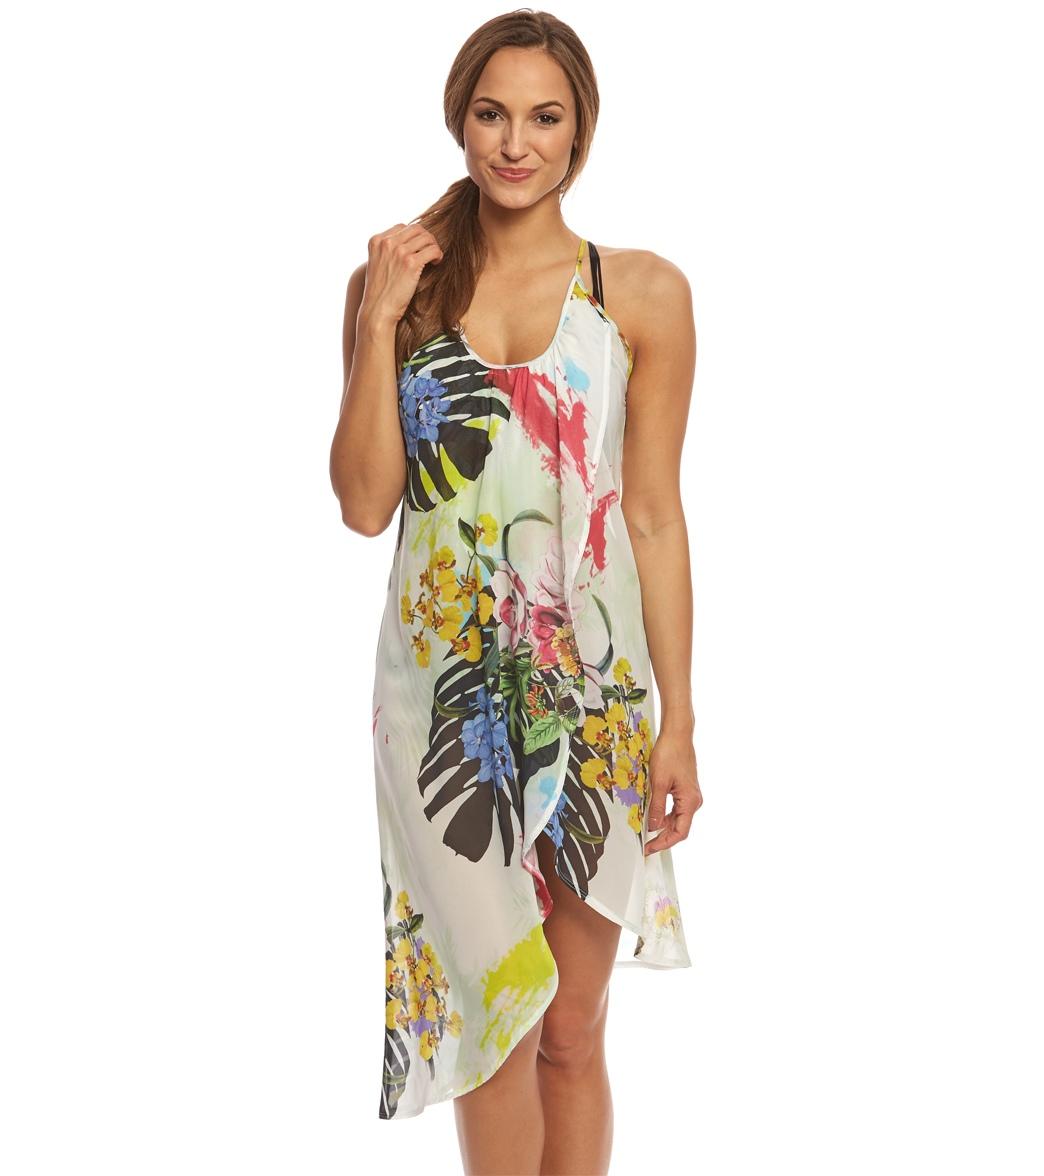 6172b04045493 ... Rappi Silhouette Tropical Wrap Dress. Play Video. MODEL MEASUREMENTS